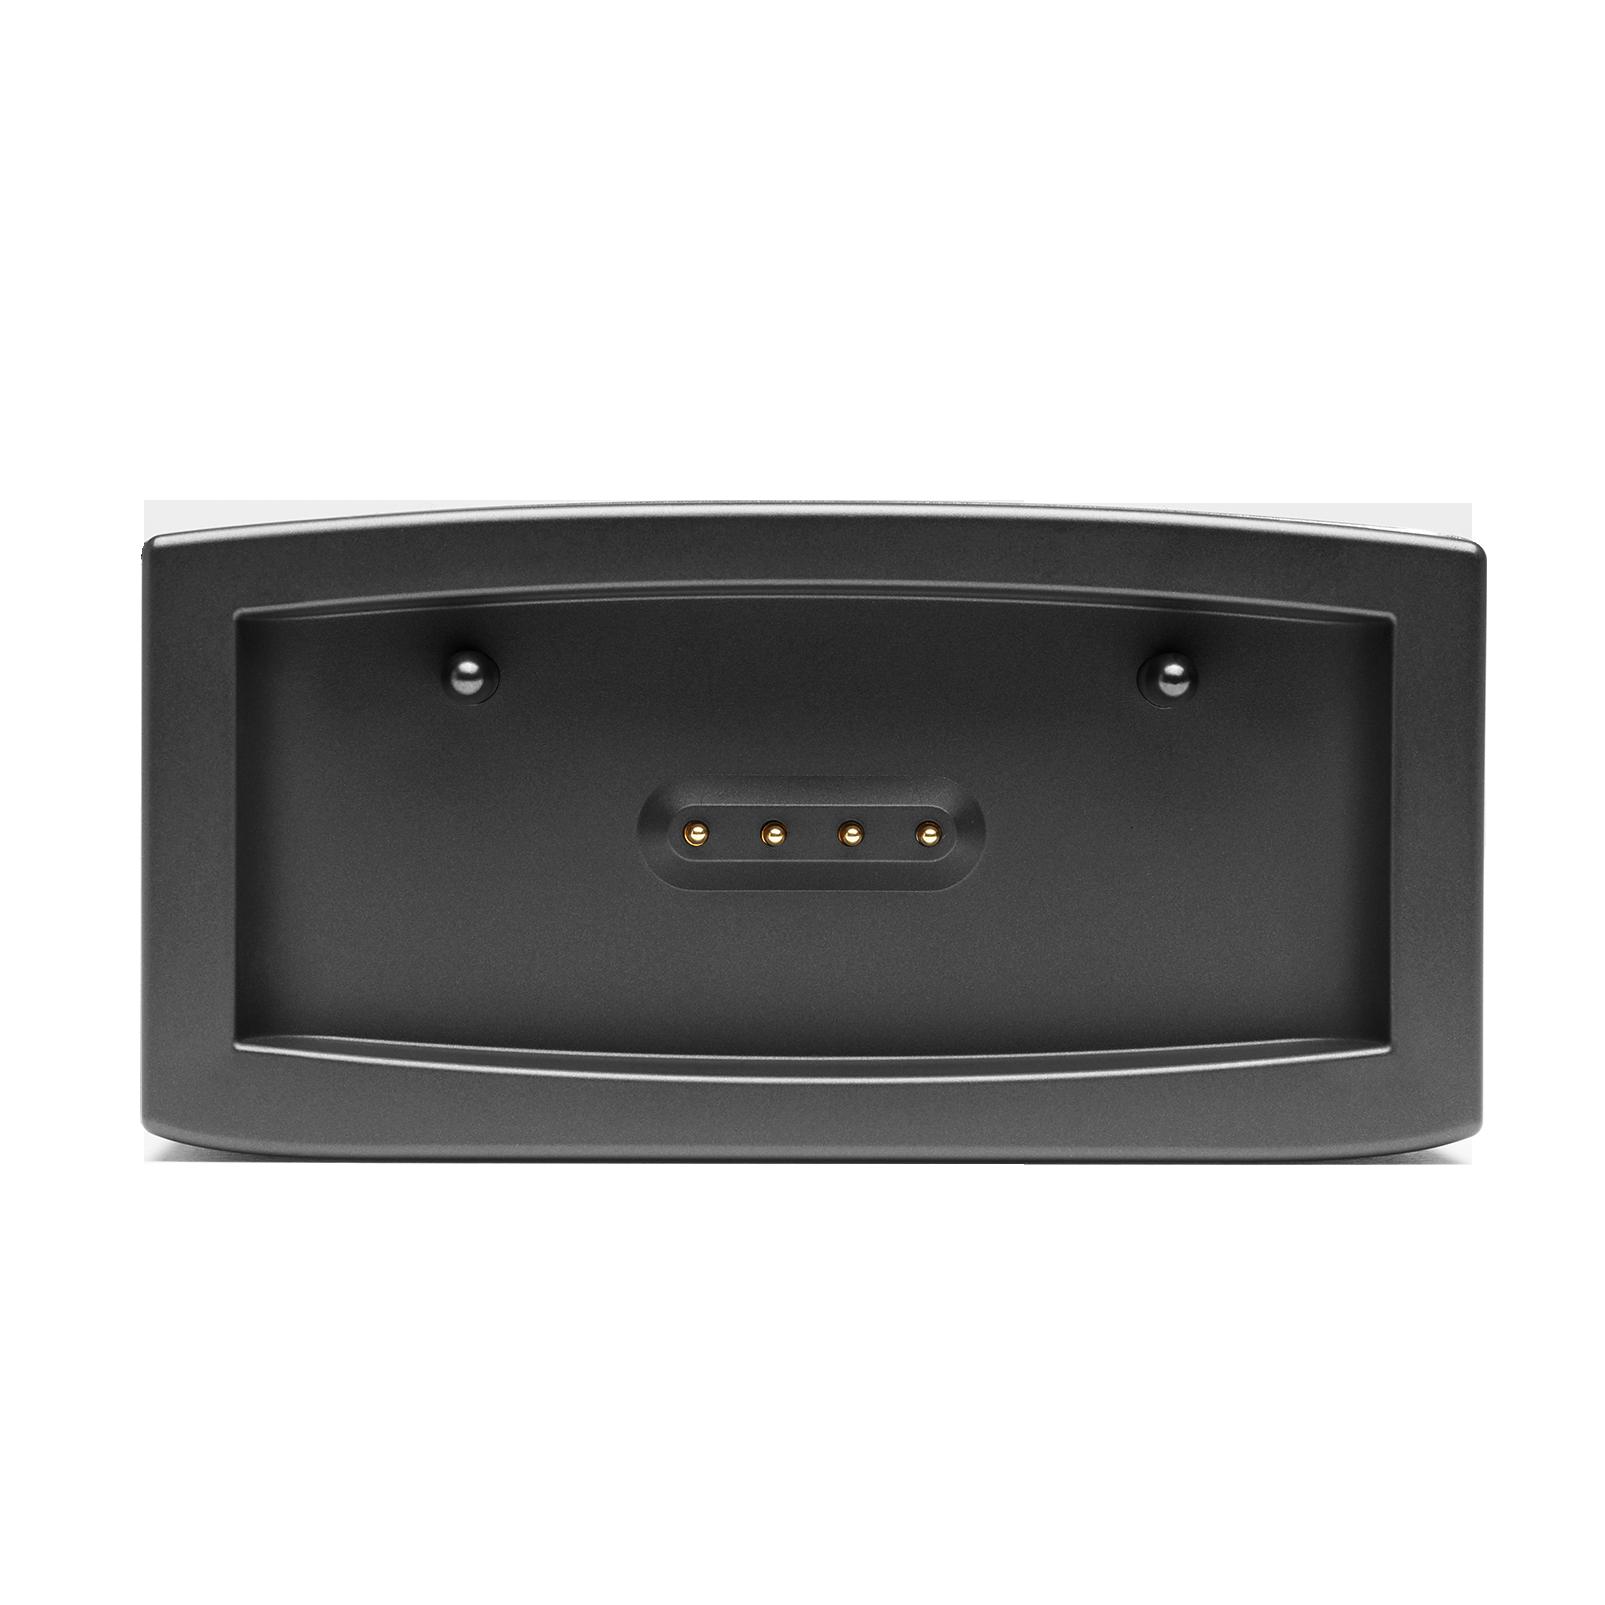 JBL BAR 9.1 True Wireless Surround with Dolby Atmos® - Black - Detailshot 2